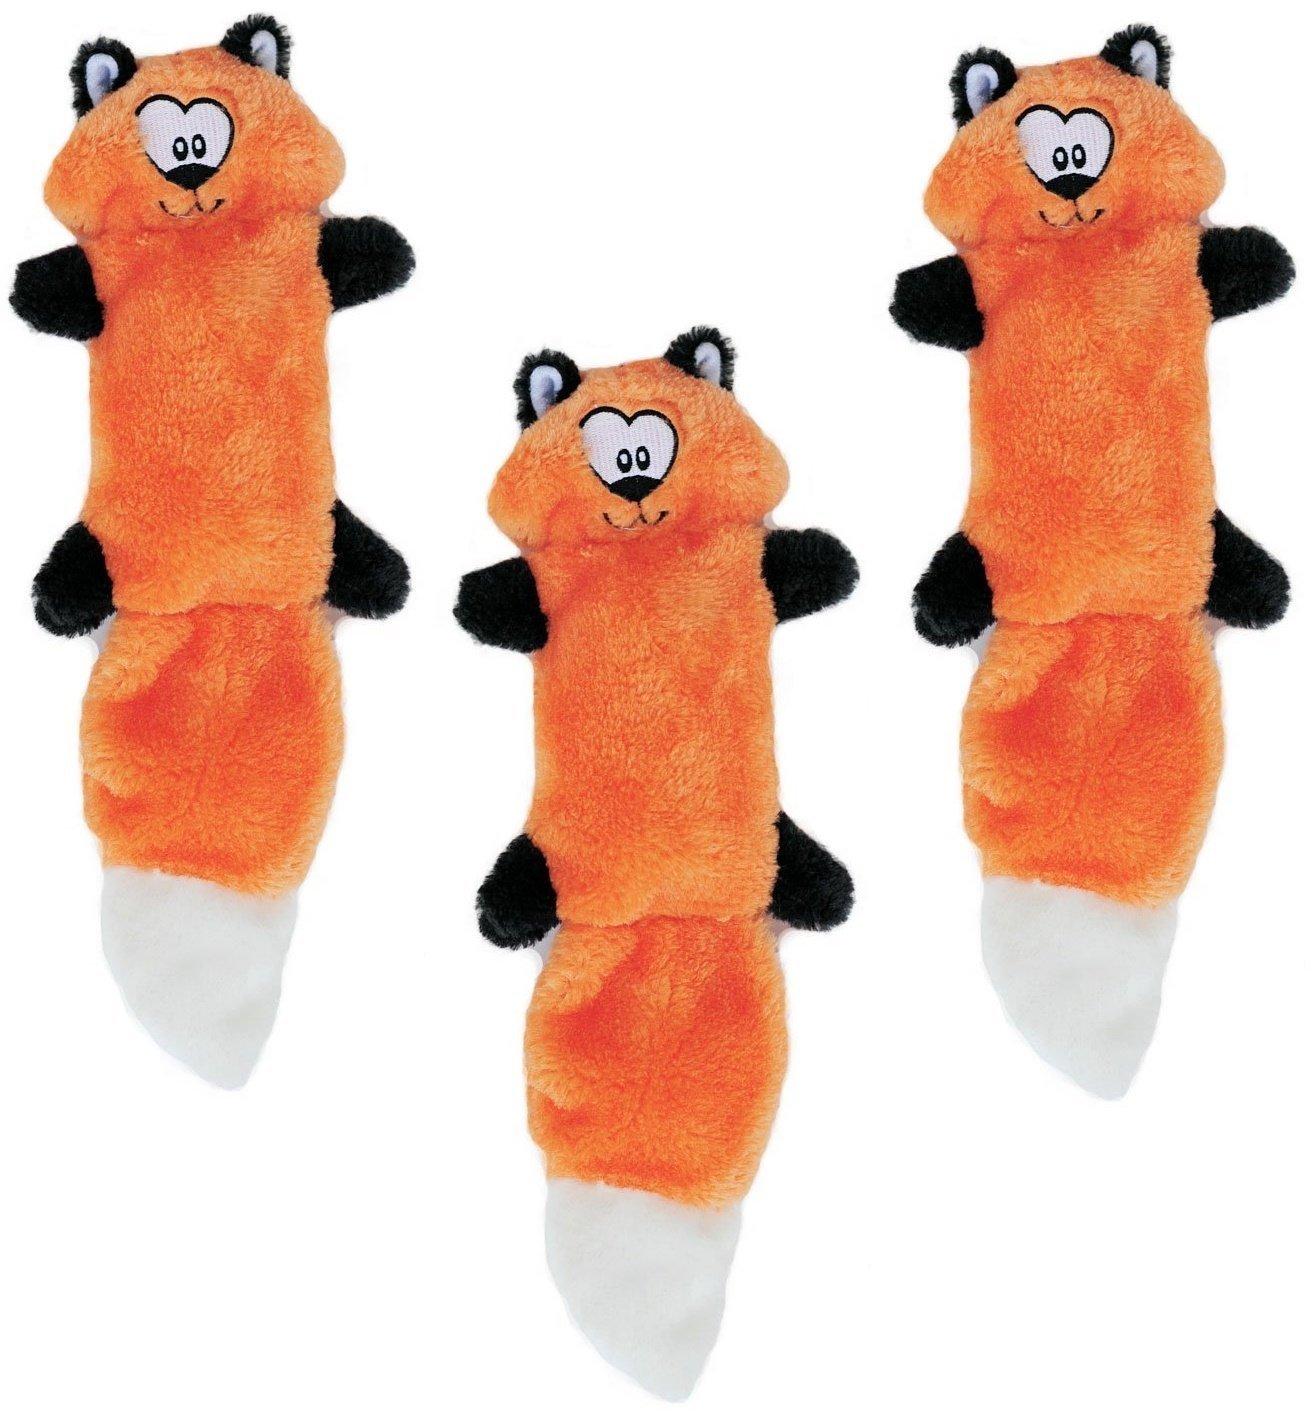 (3 Pack) ZippyPaws Zingy 3-Squeaker No Stuffing Plush Dog Toys, Fox